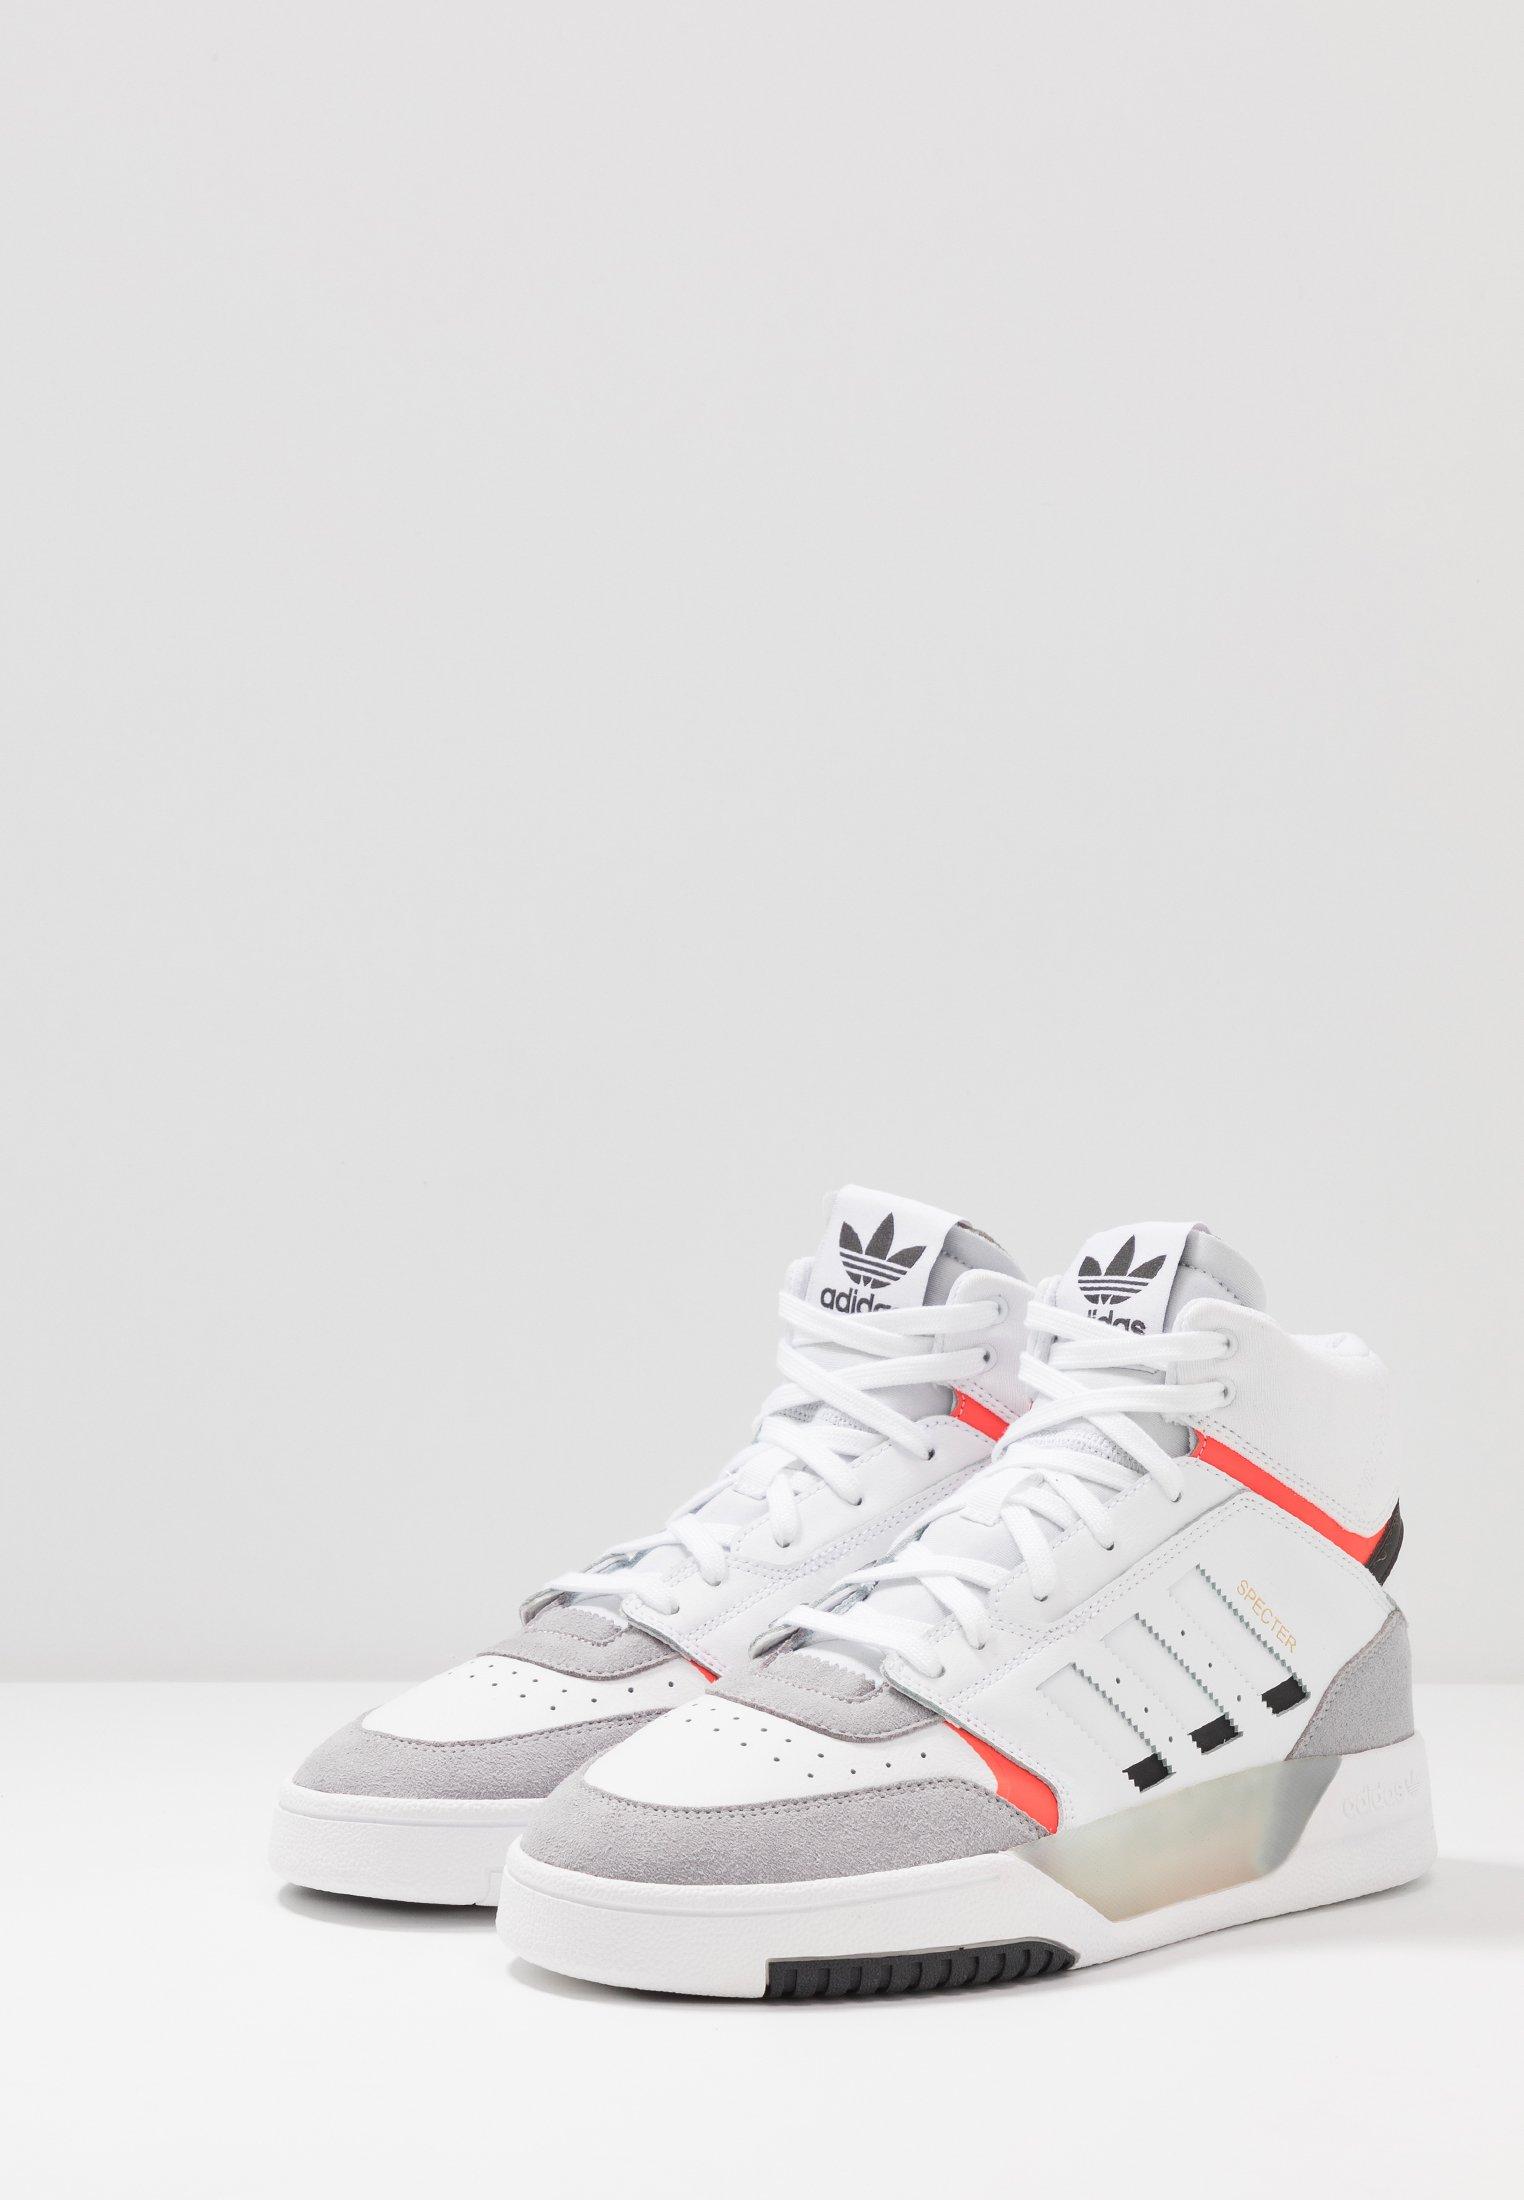 White Footwear StepSneakers Originals solar Adidas Drop Alte granit Red 3LqAR4j5